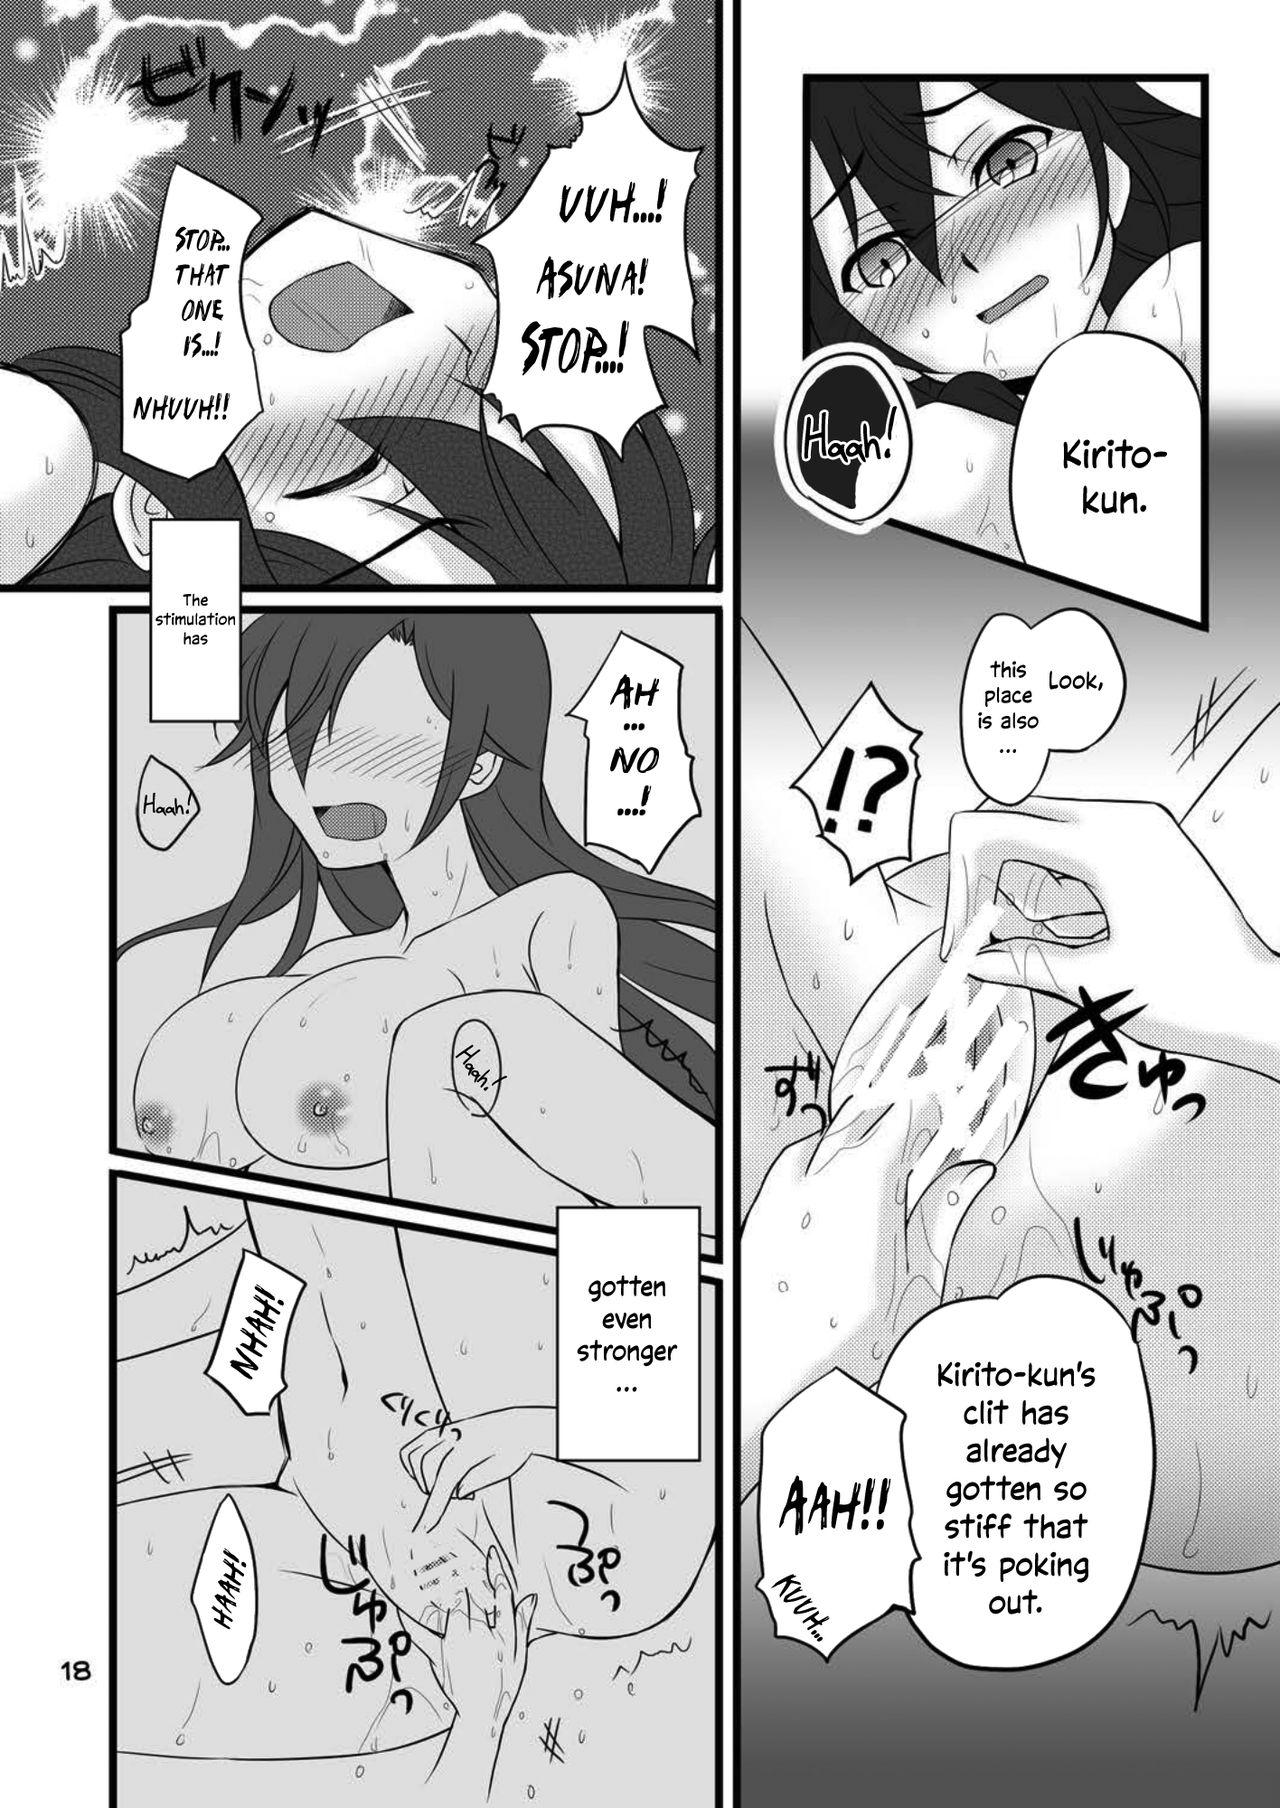 [AQUA SPACE (Asuka)] Kiriko-chan to Asobou! | Let's play with Kiriko-chan! (Sword Art Online) [English] [EHCOVE] [Digital] 17